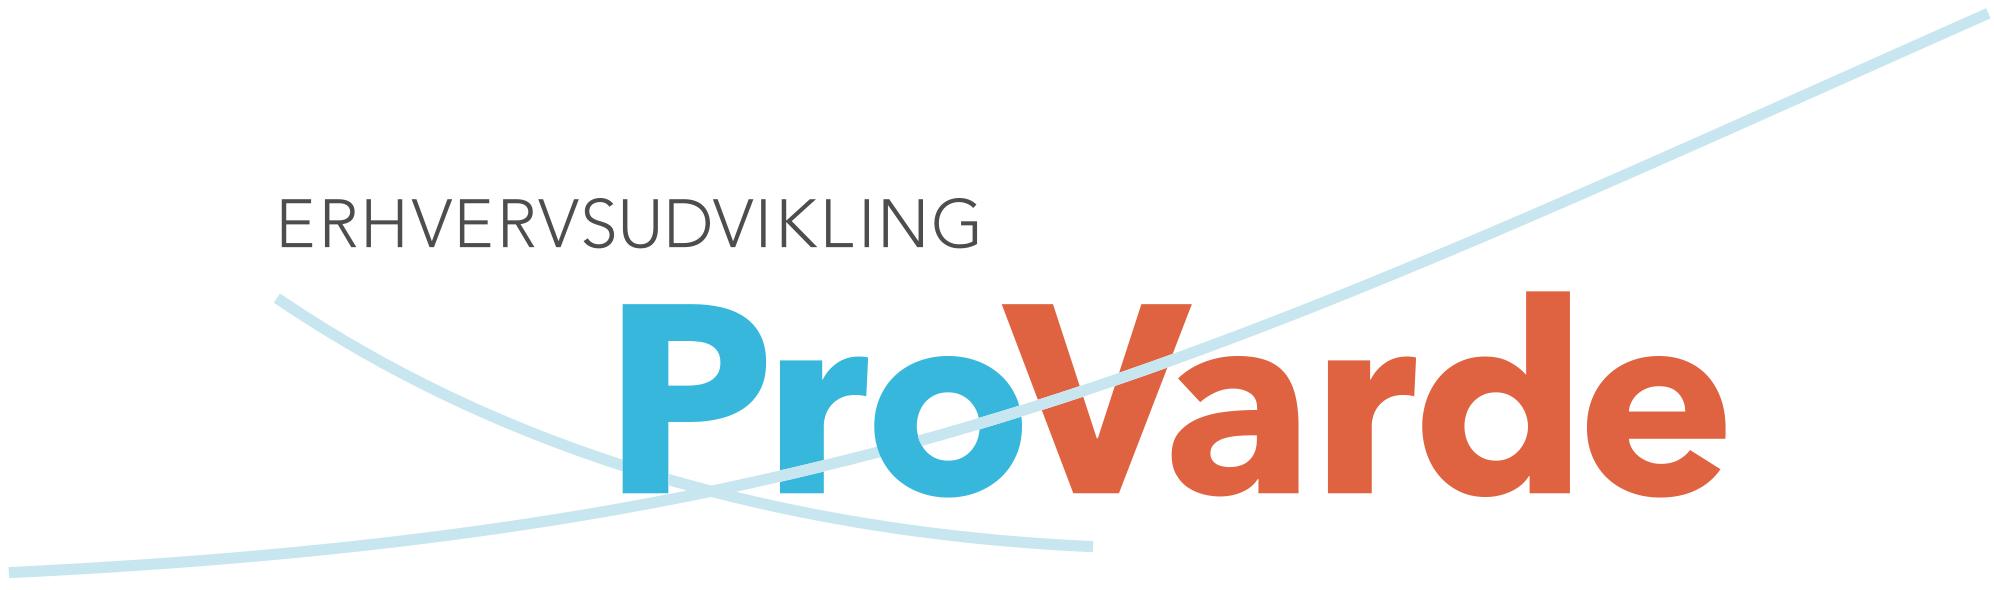 Provarde logo.png